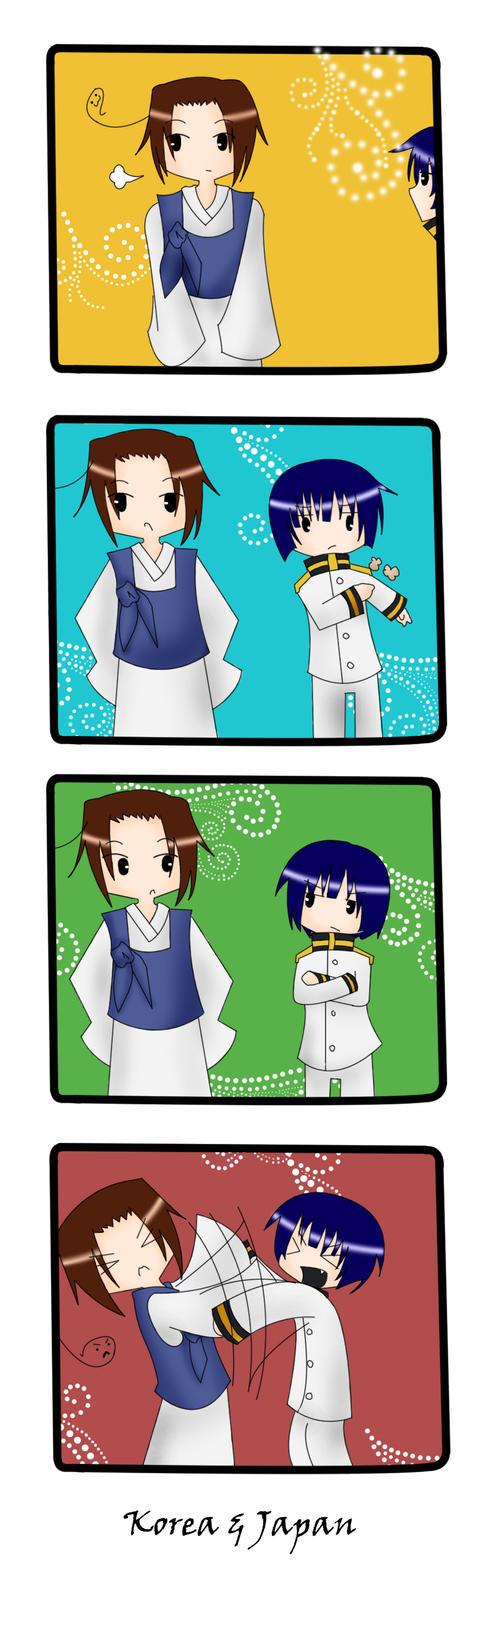 korea and japan relationship